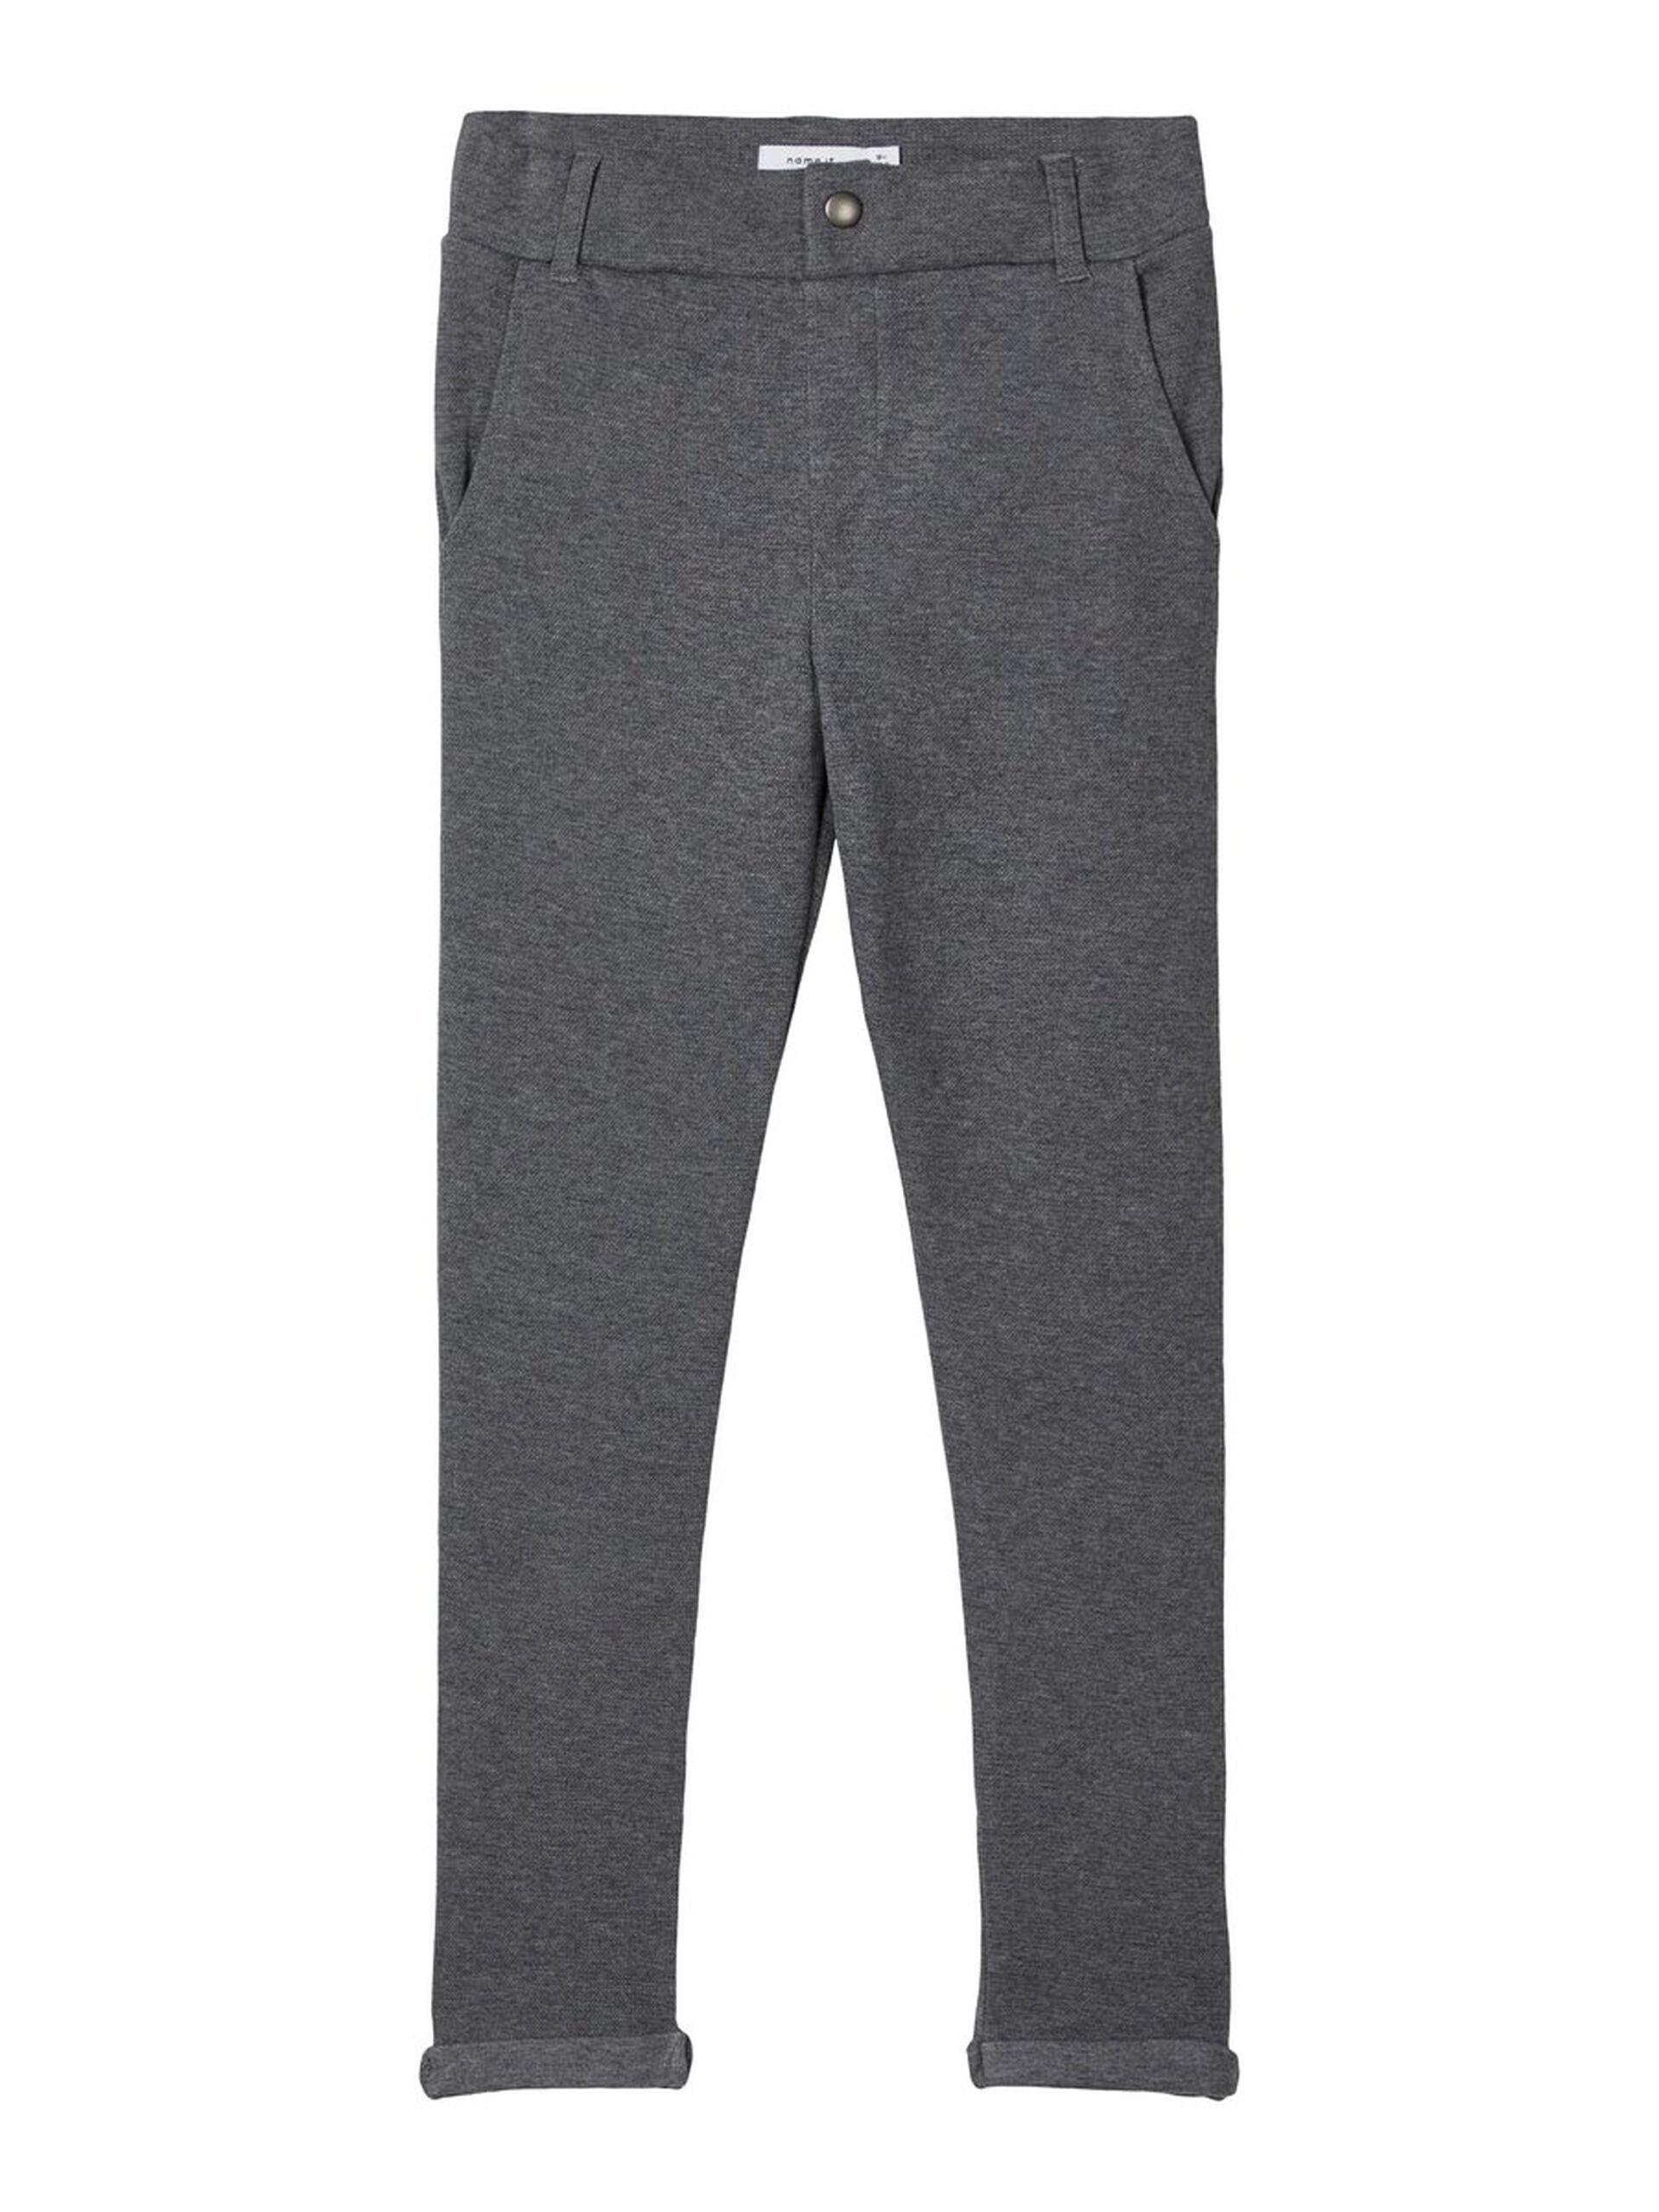 Smal joggebukse barn – Name It grå sweat-pant  – Mio Trend